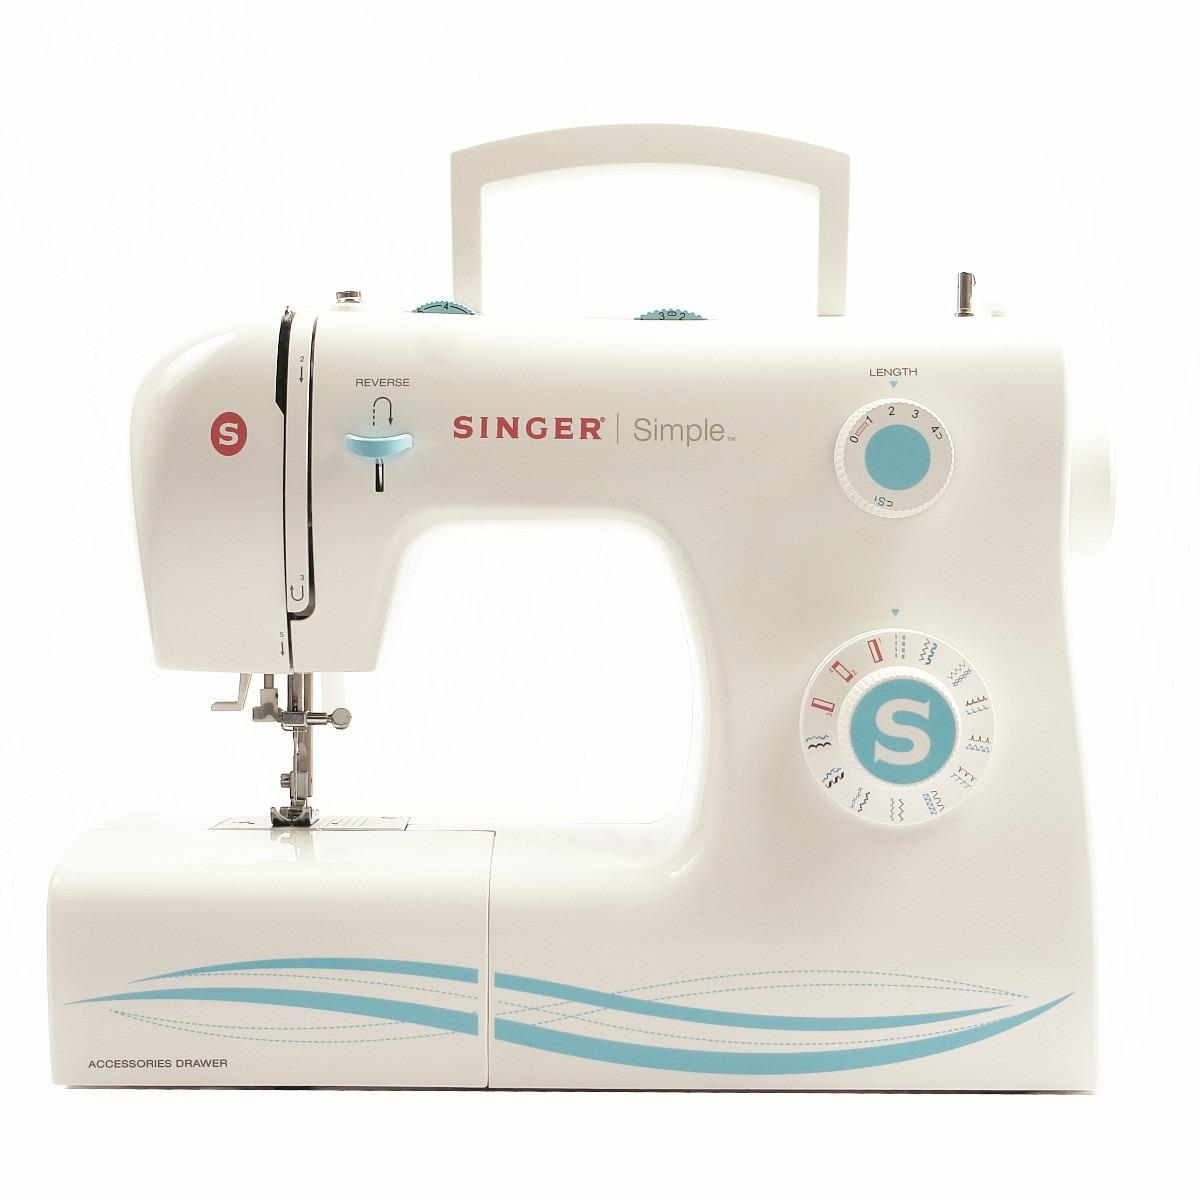 Singer maquinas de coser - Maquinas de coser ladys ...